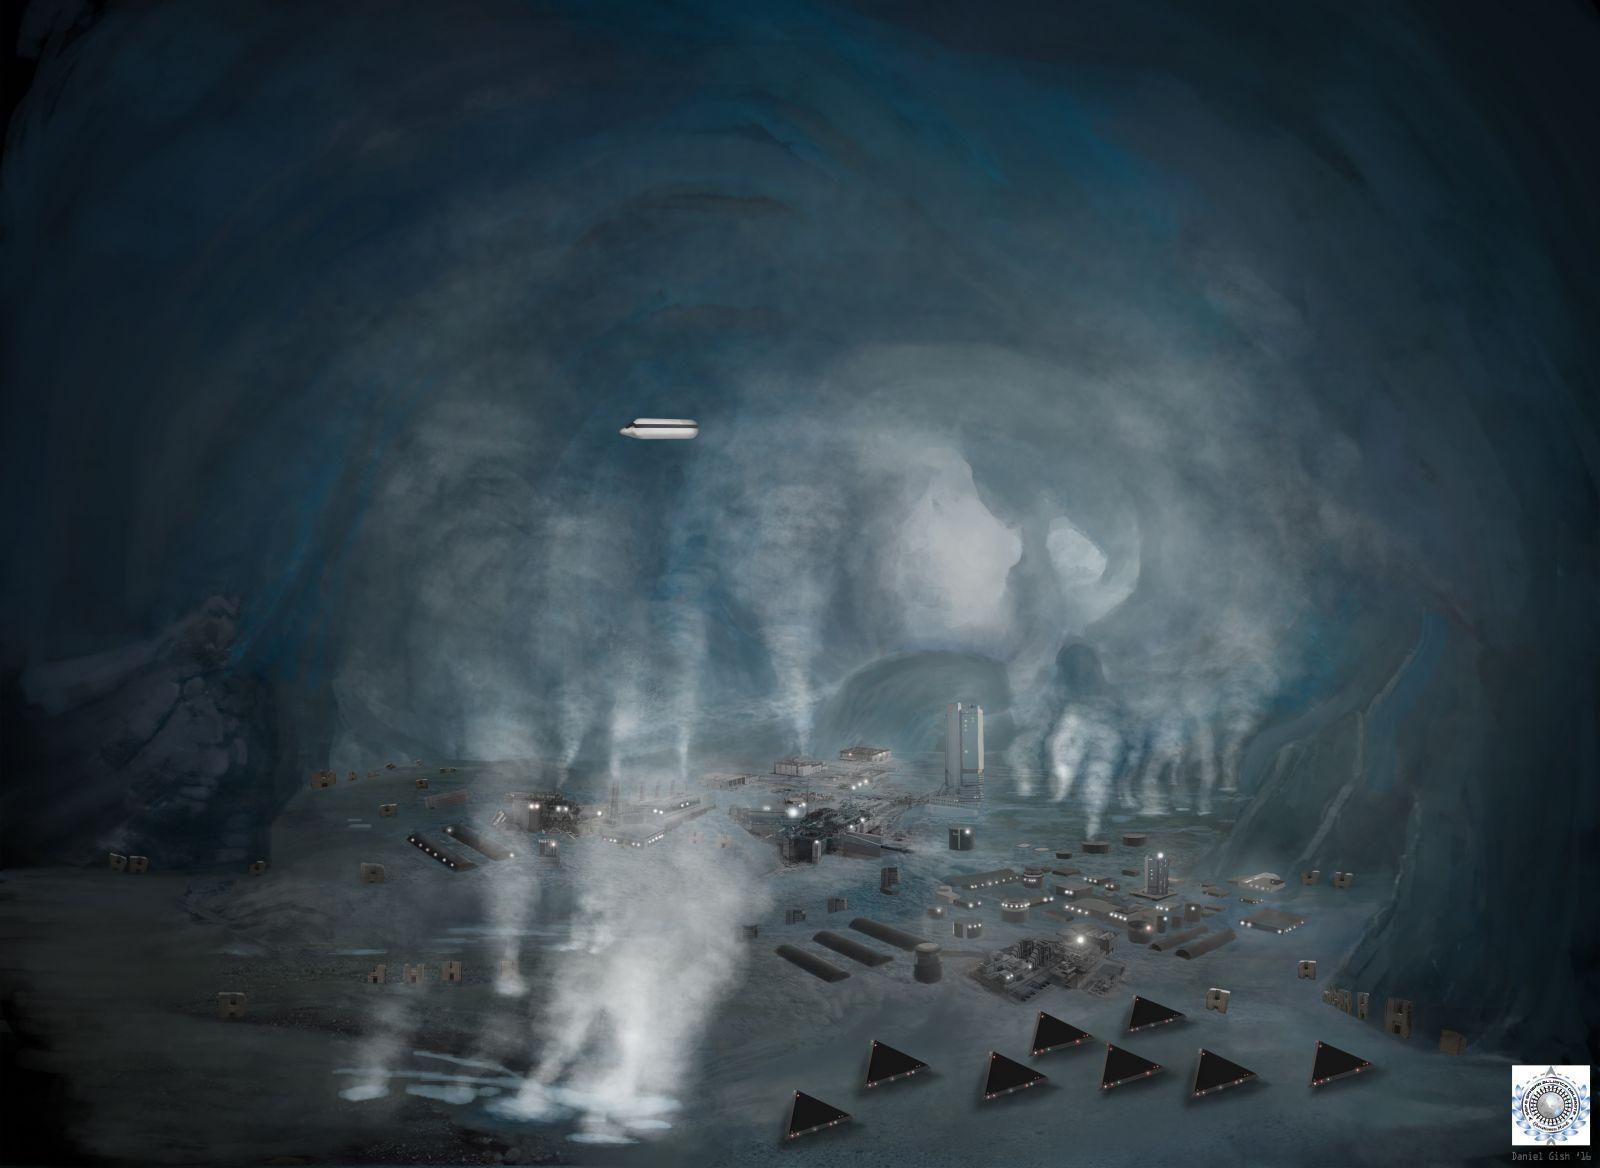 02-antarctica-under-the-ice-final